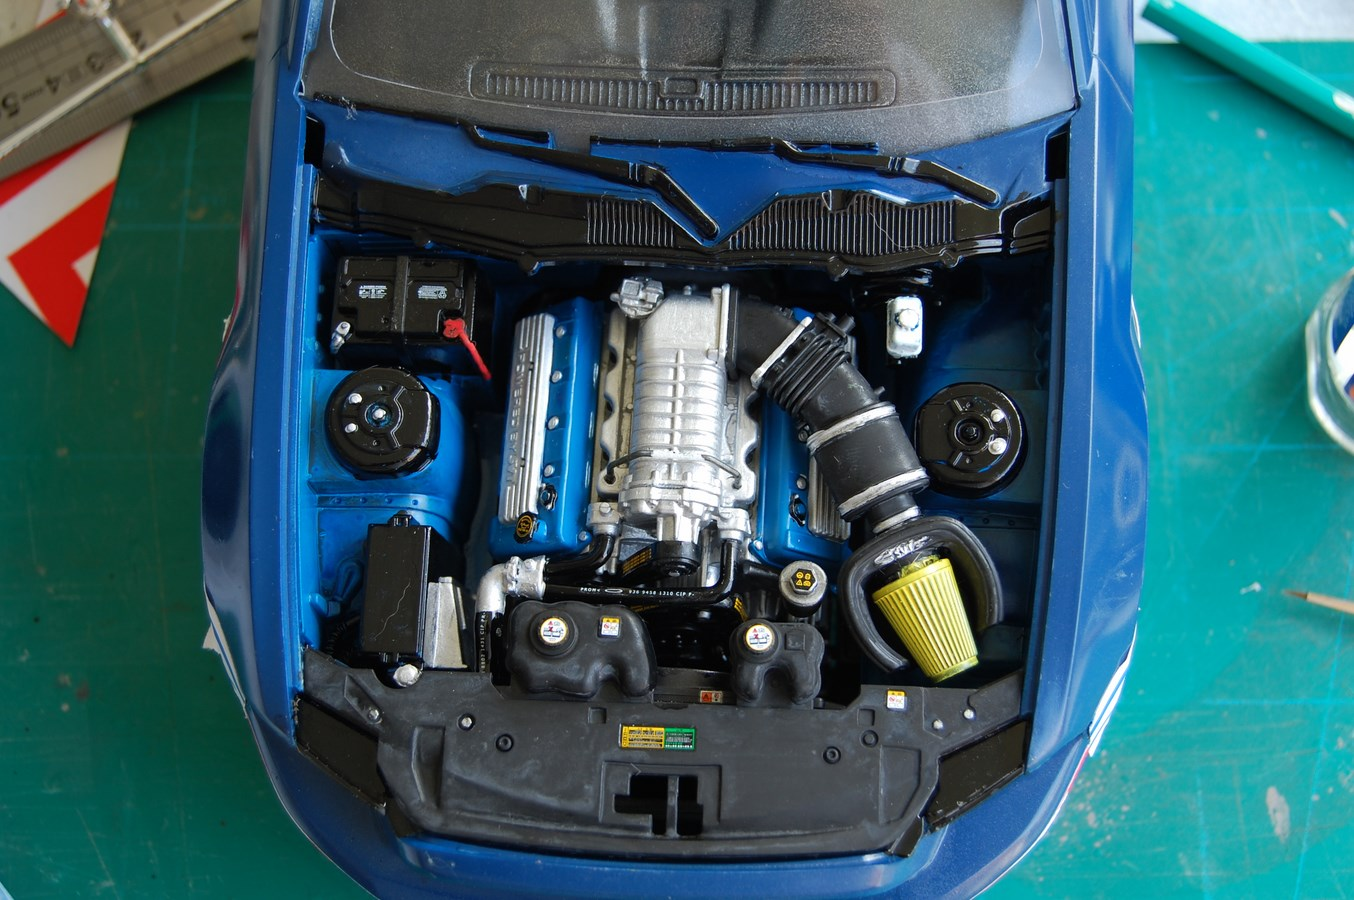 Shelby GT 500 version imaginaire Gendarmerie - Page 2 734256Mustang38Copier